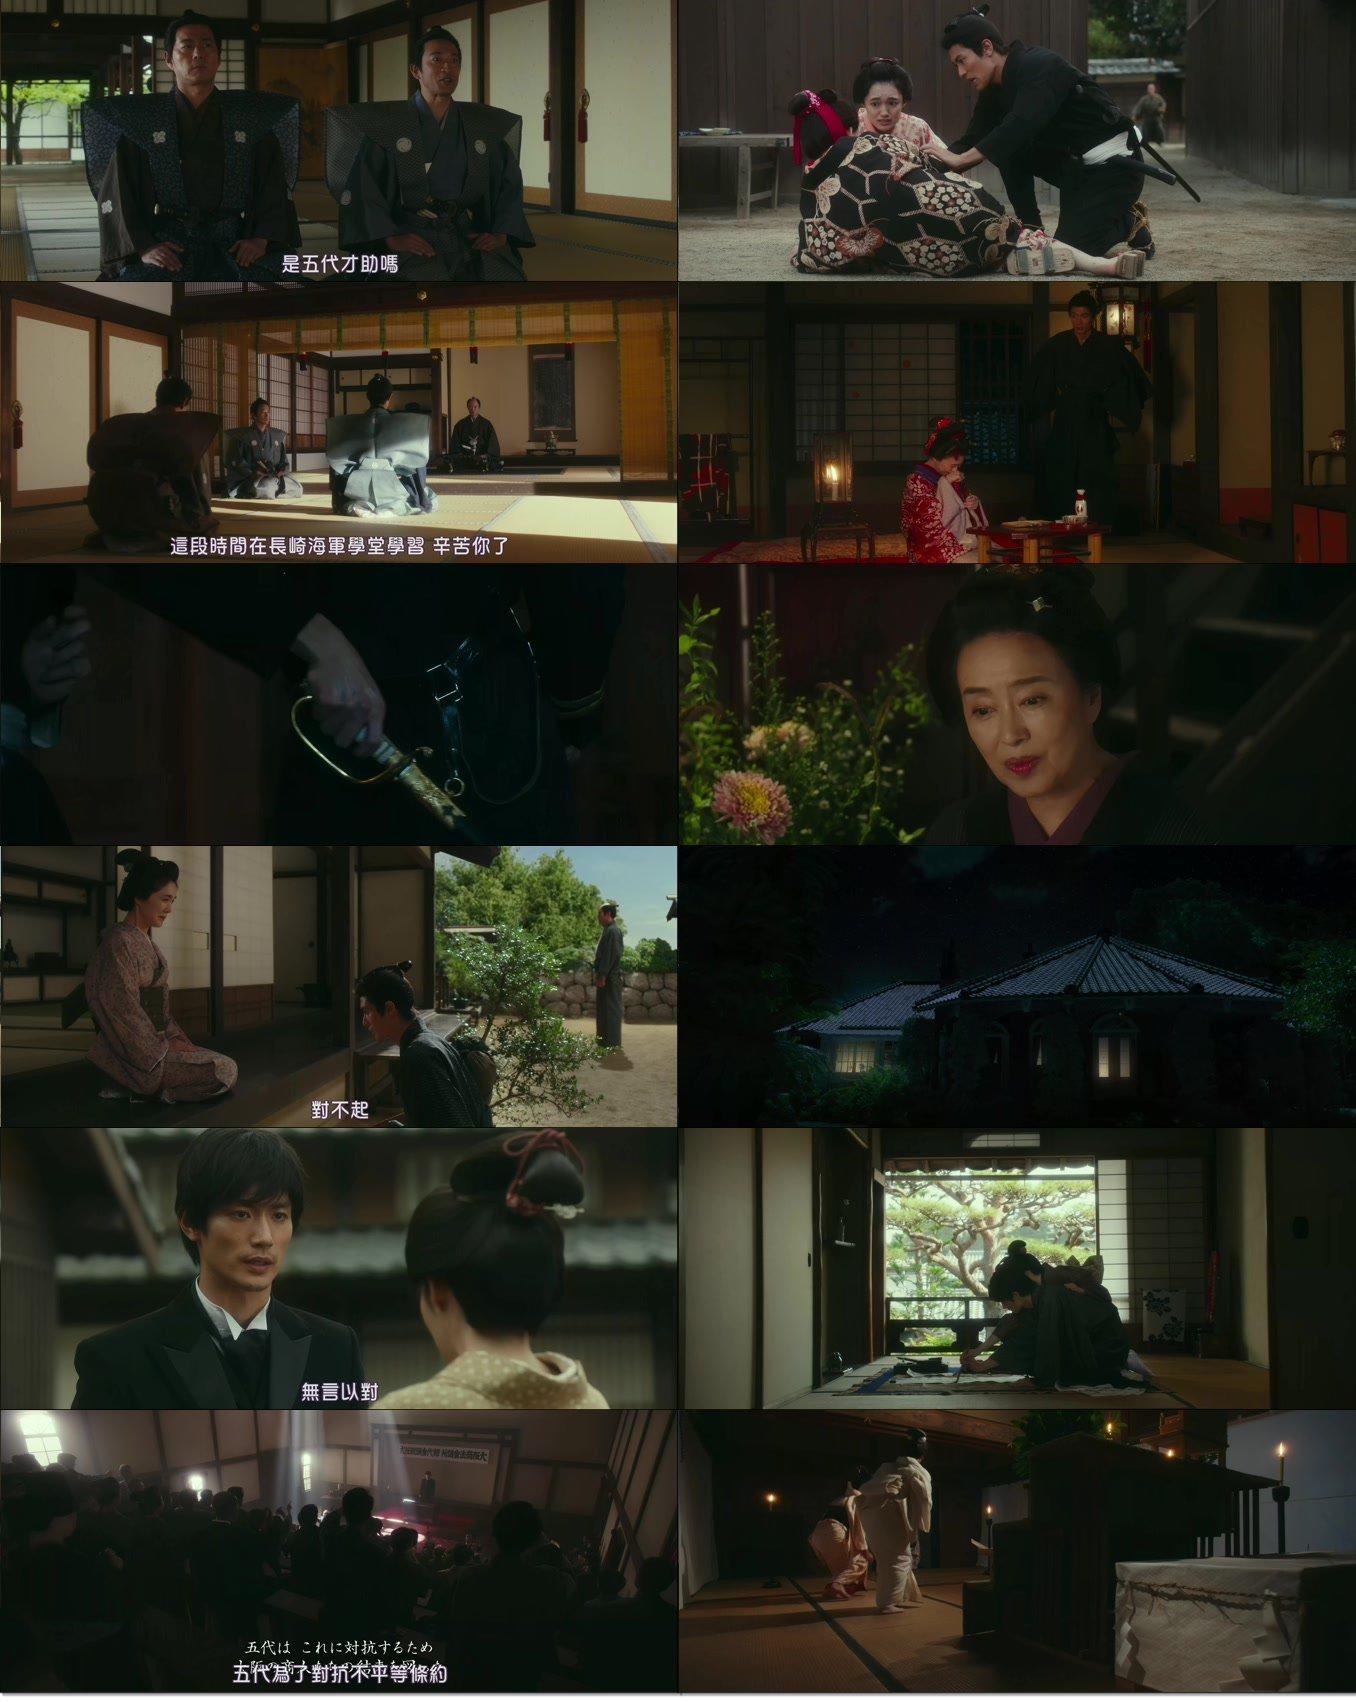 [x2][日本]天外者|無名世界的終結.Bluray.1080p[繁簡]